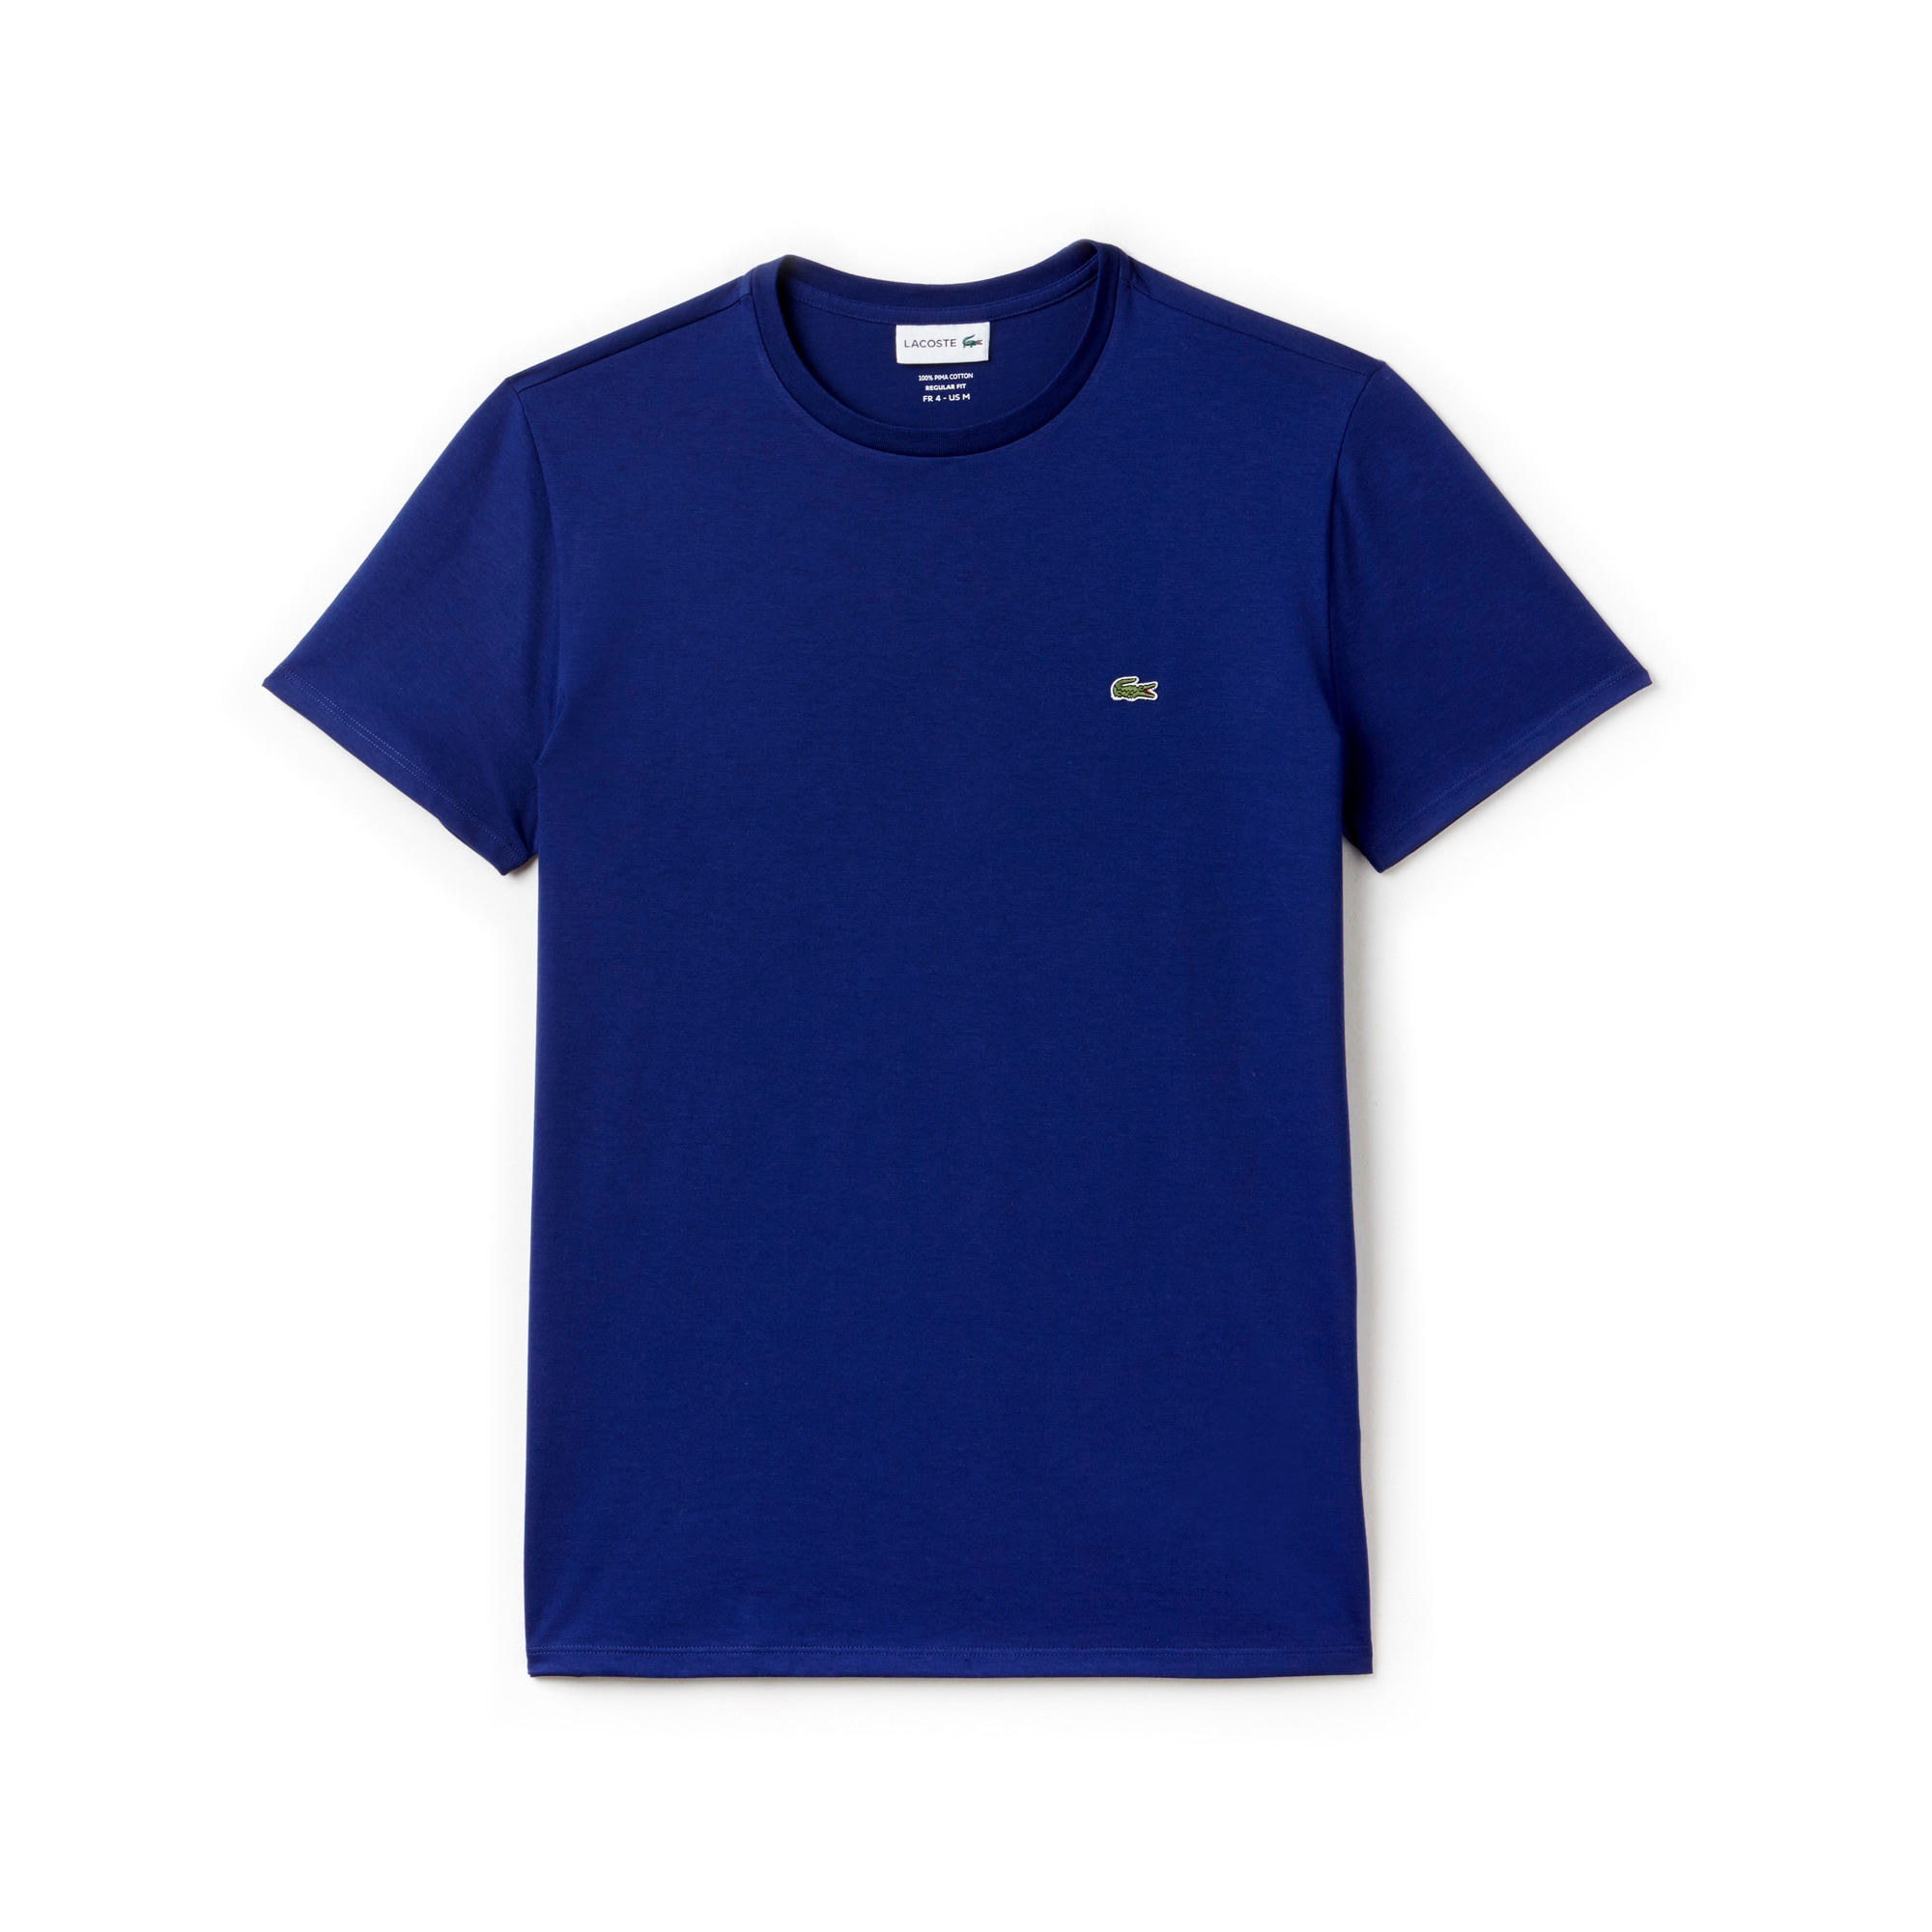 0d61efaa86fcf Camisetas